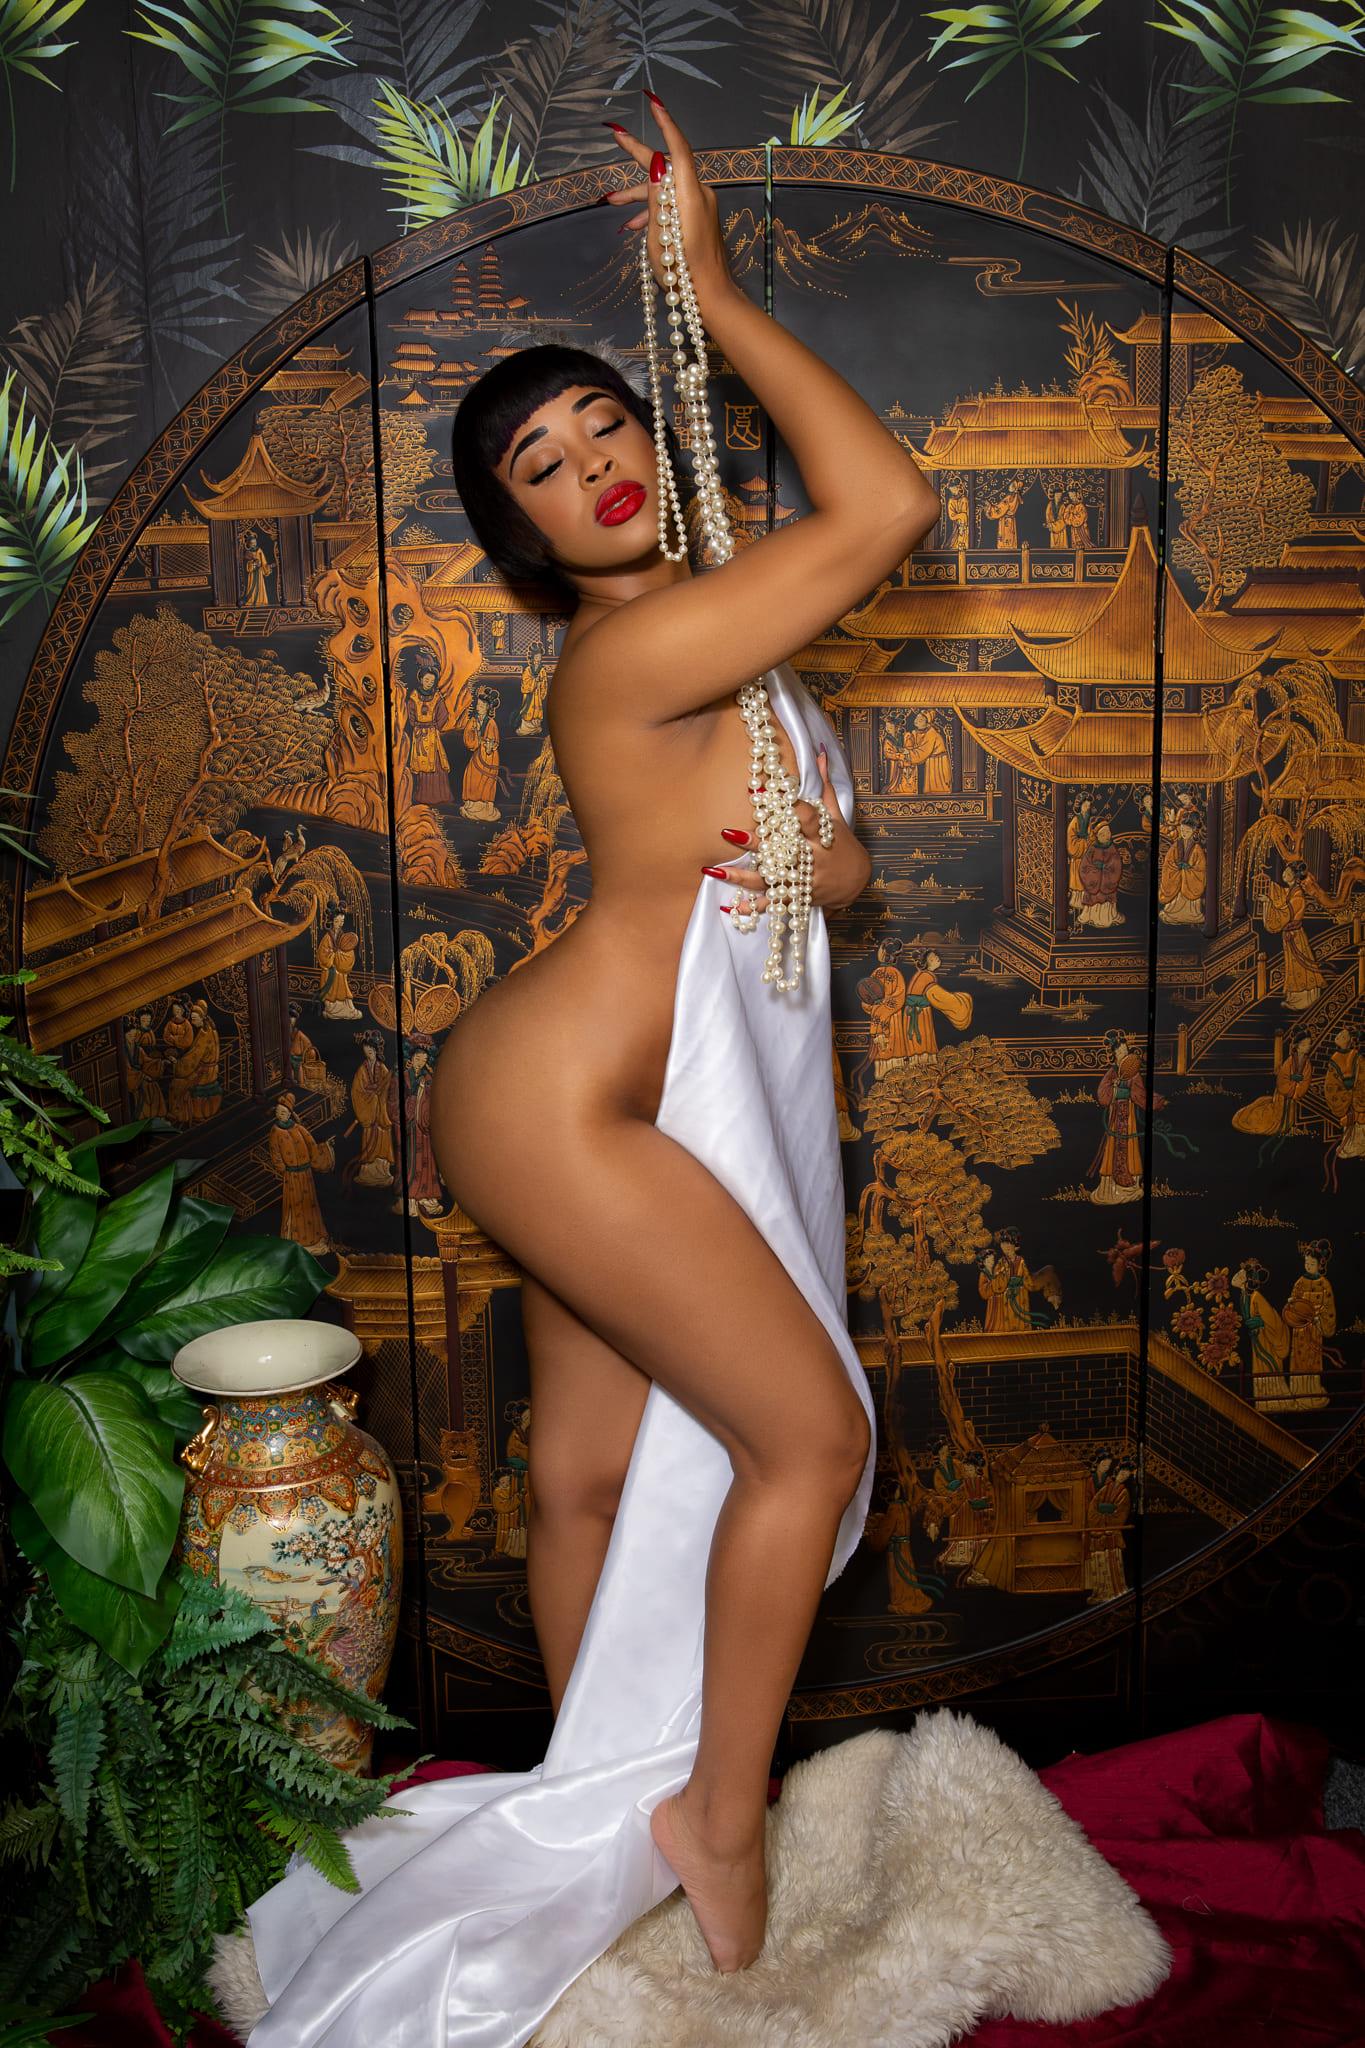 Model Posing in Vintage Oriental Themed Set